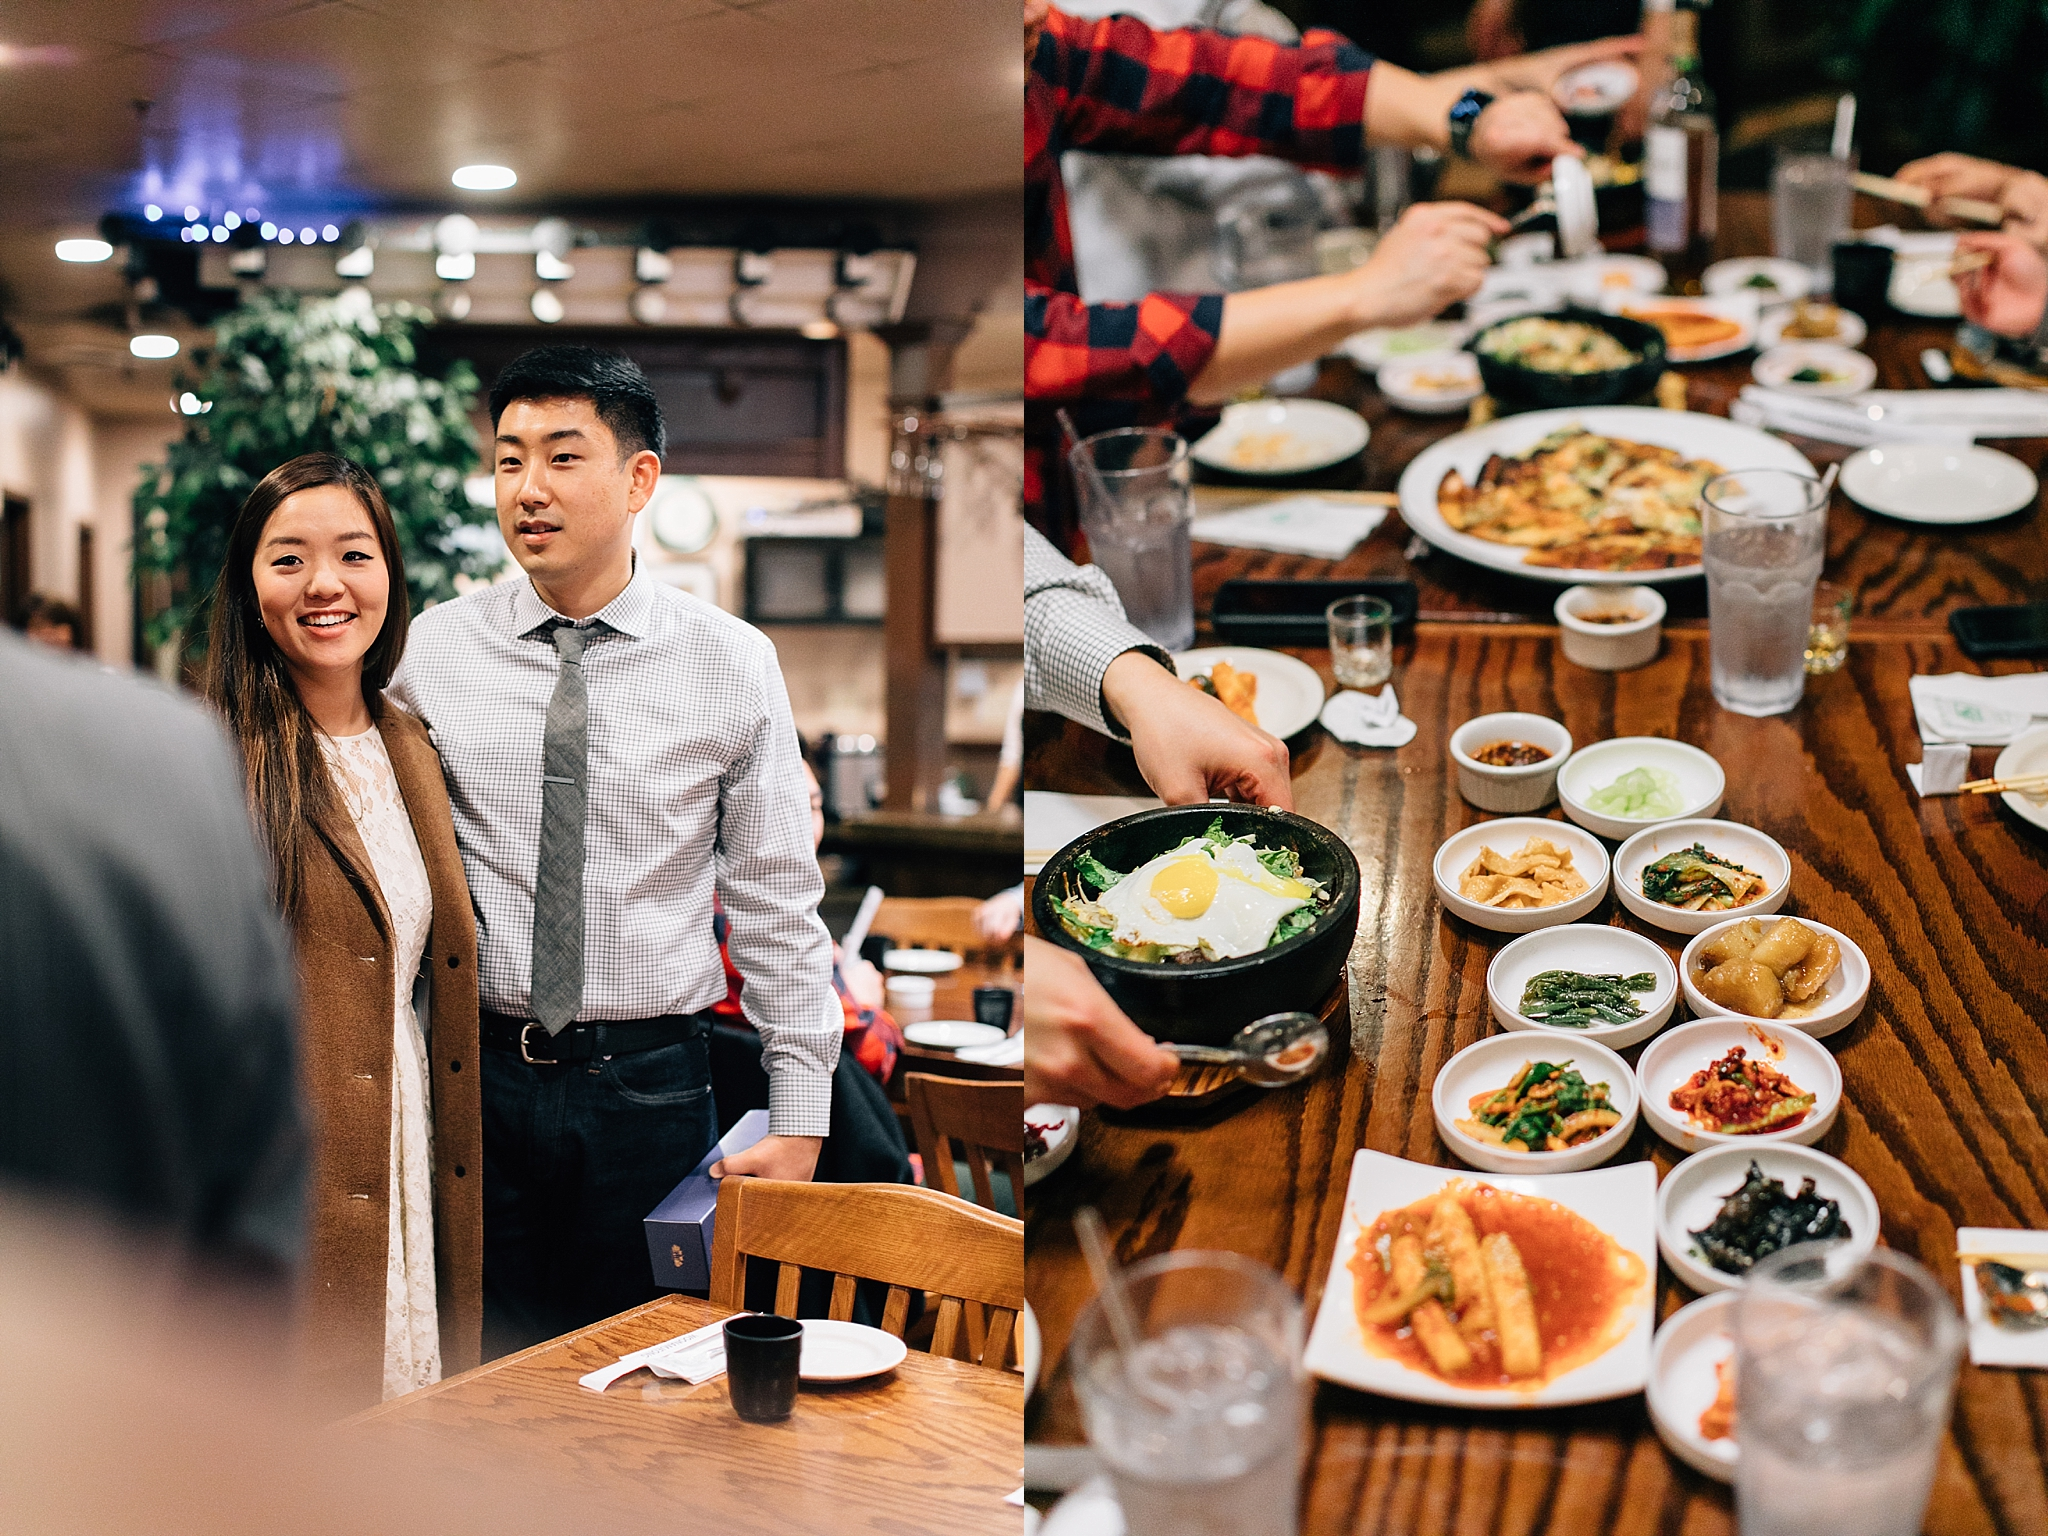 woo-nam-jeong-dinner